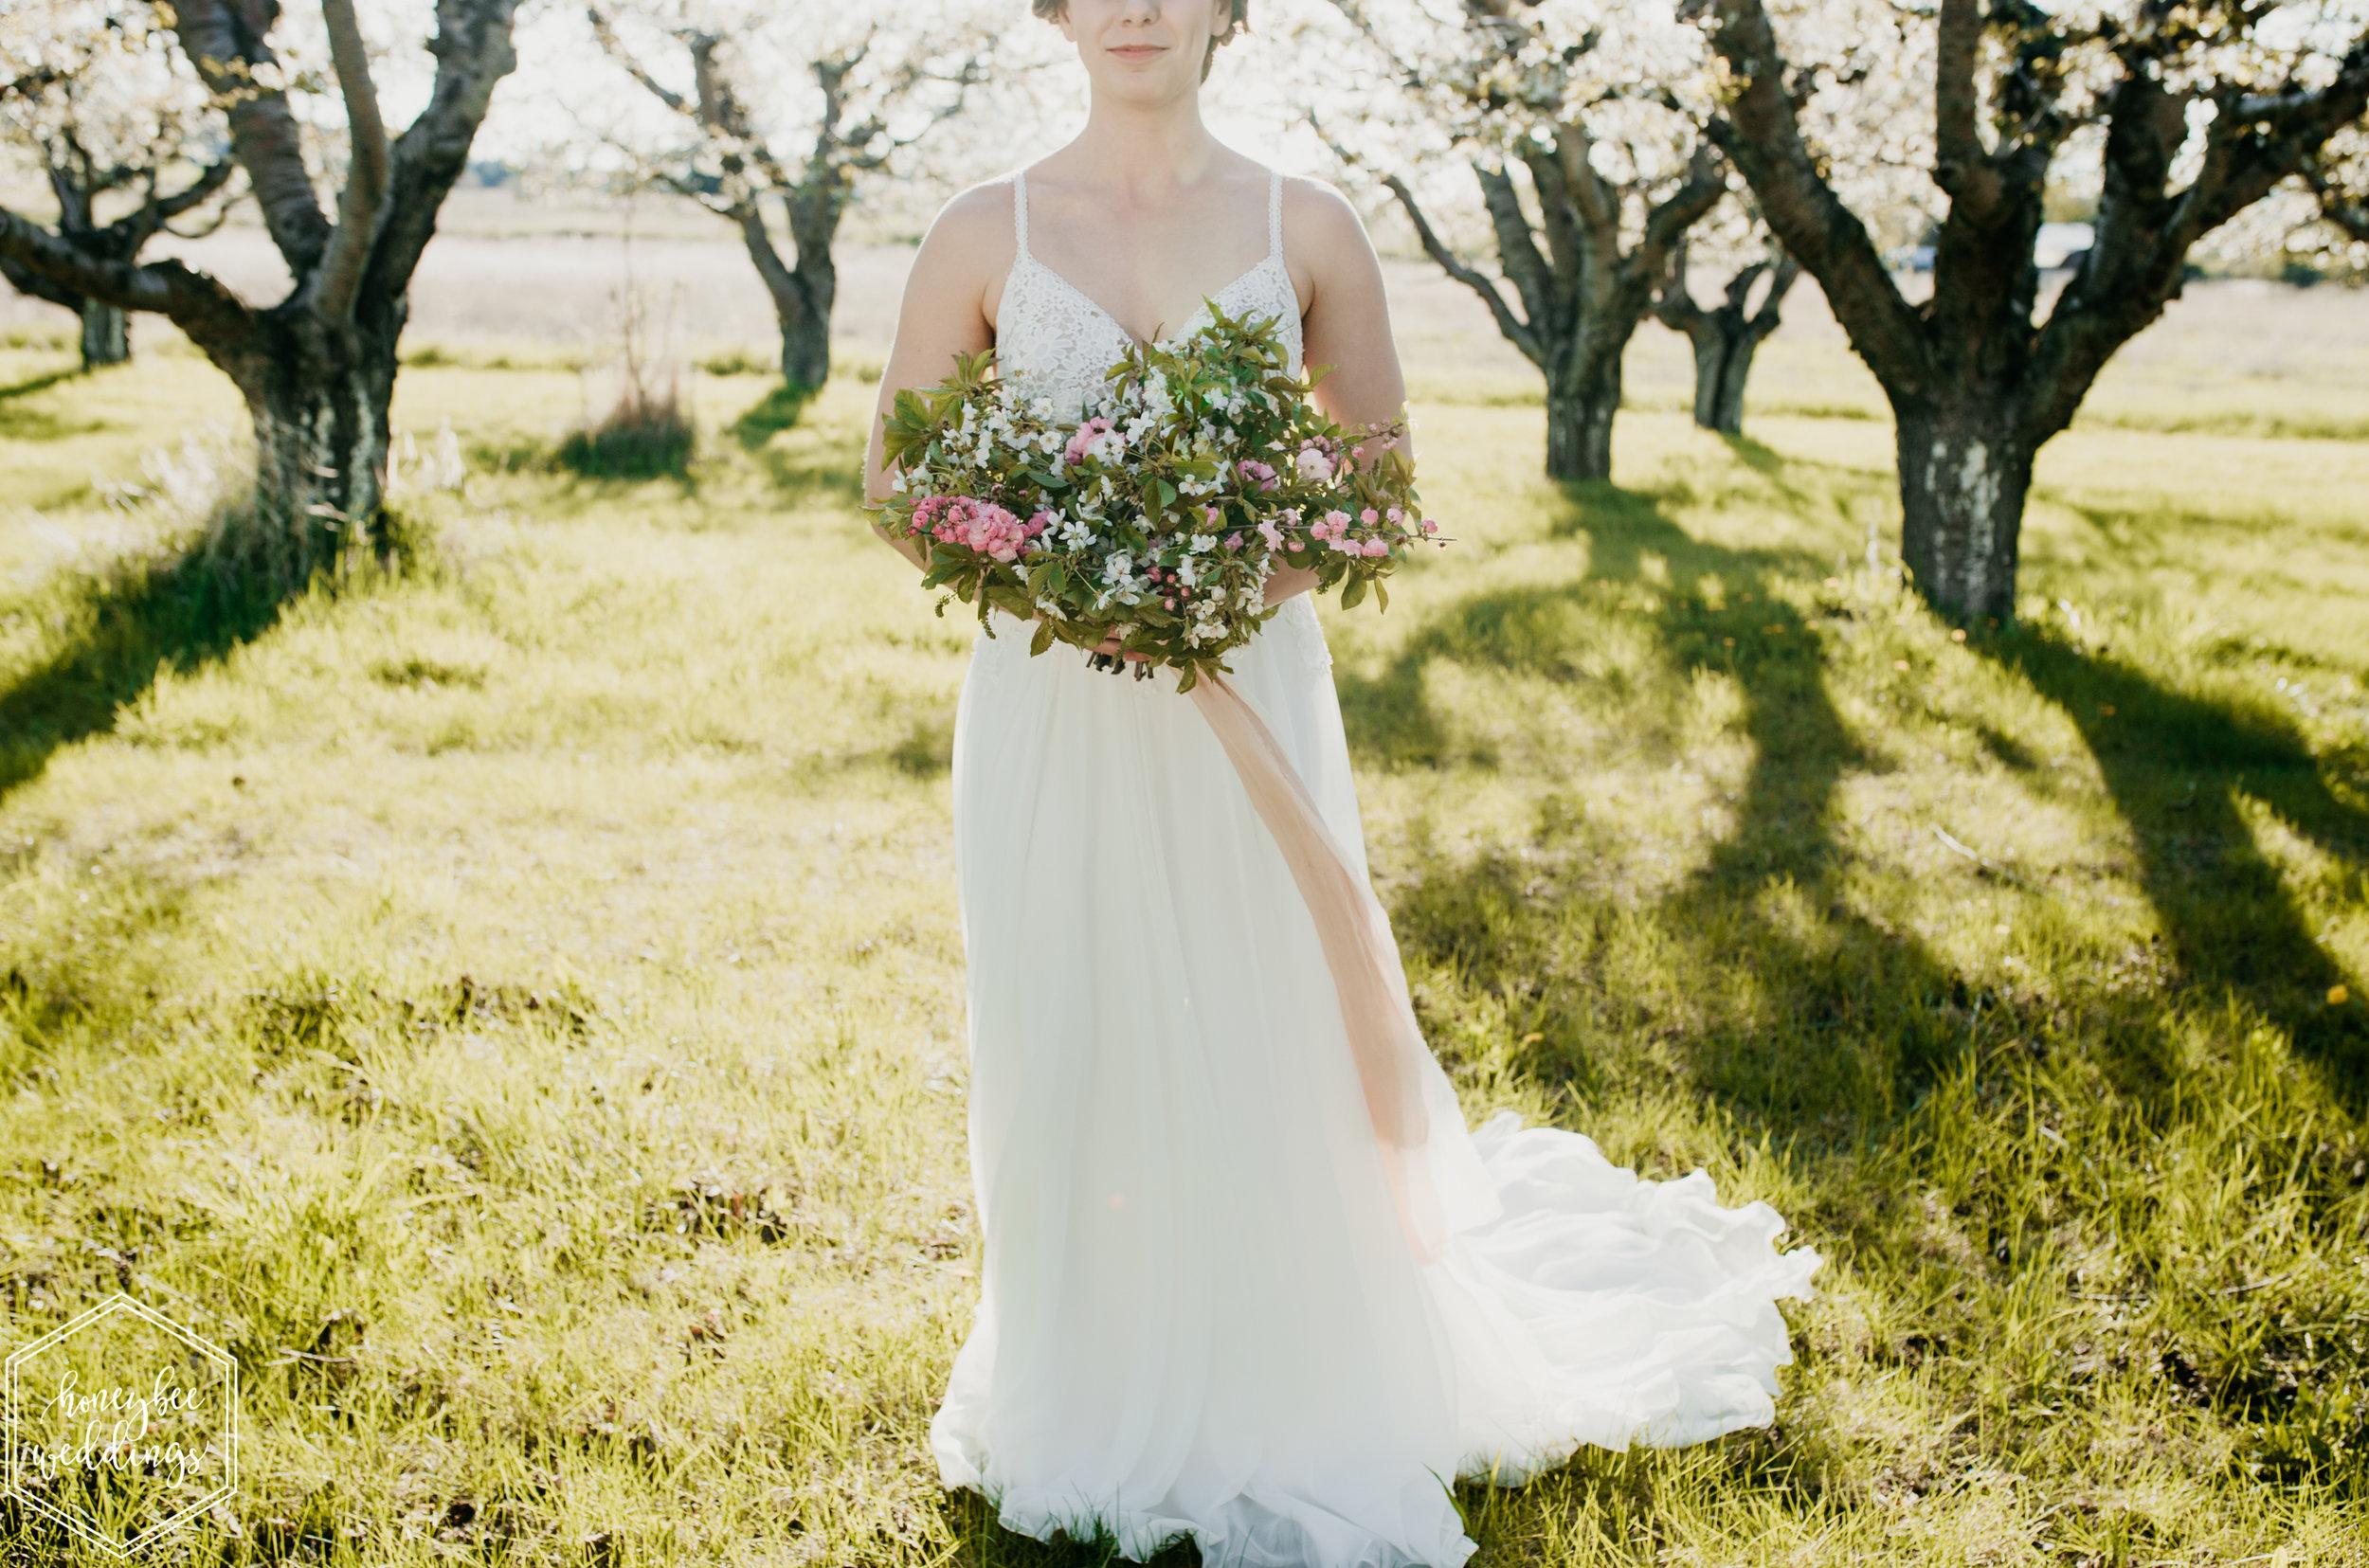 021Cherry Blossom Wedding_Styled Photoshoot_Honeybee Weddings_May 11, 2019-87.jpg